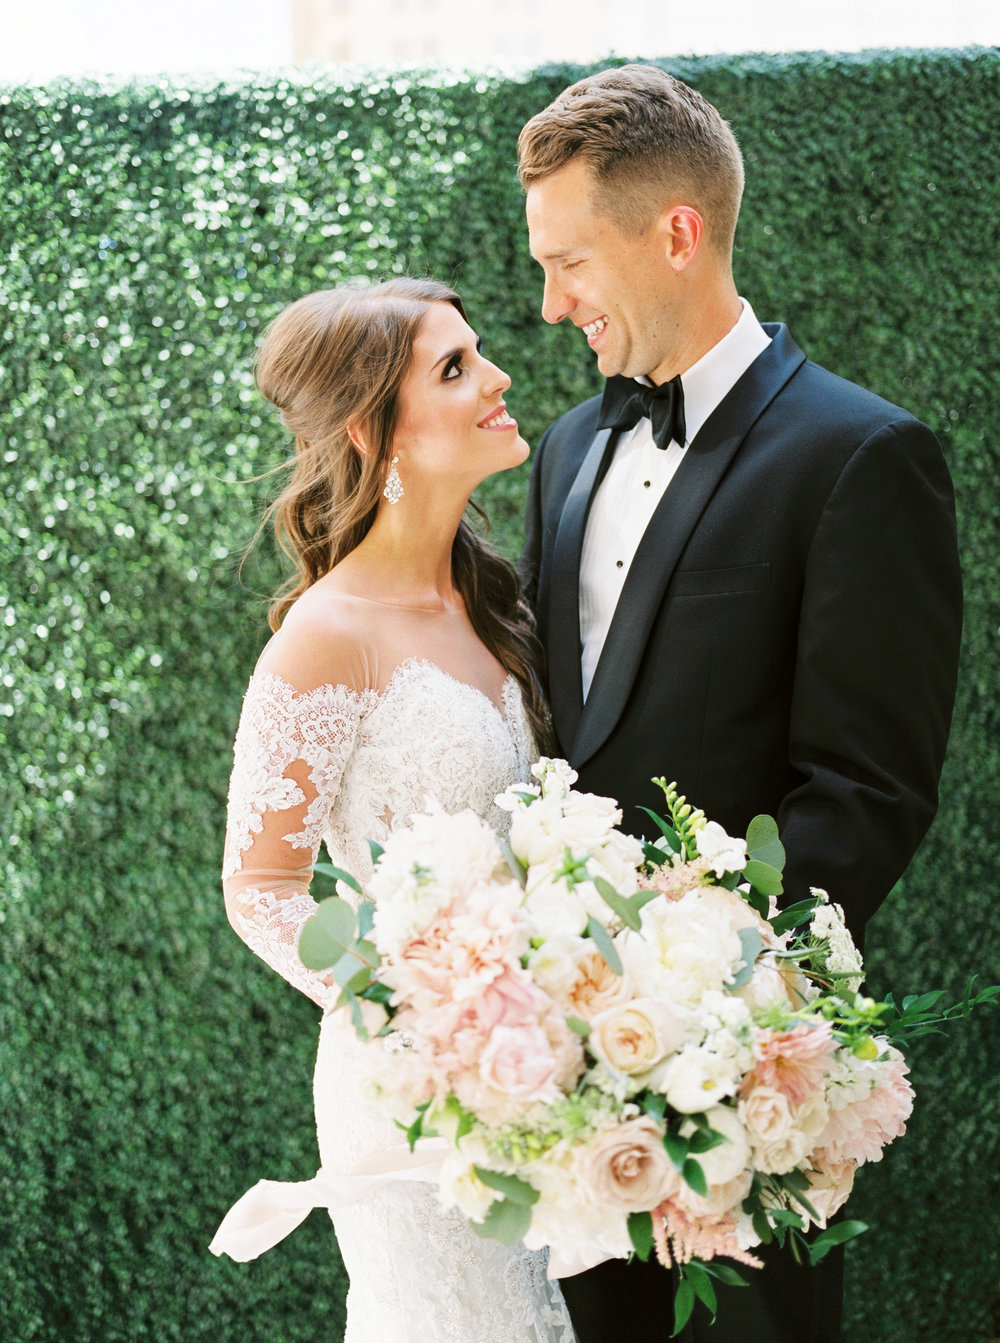 Elegant Dallas Wedding at the Adolphus Hotel - Lindsey Brunk